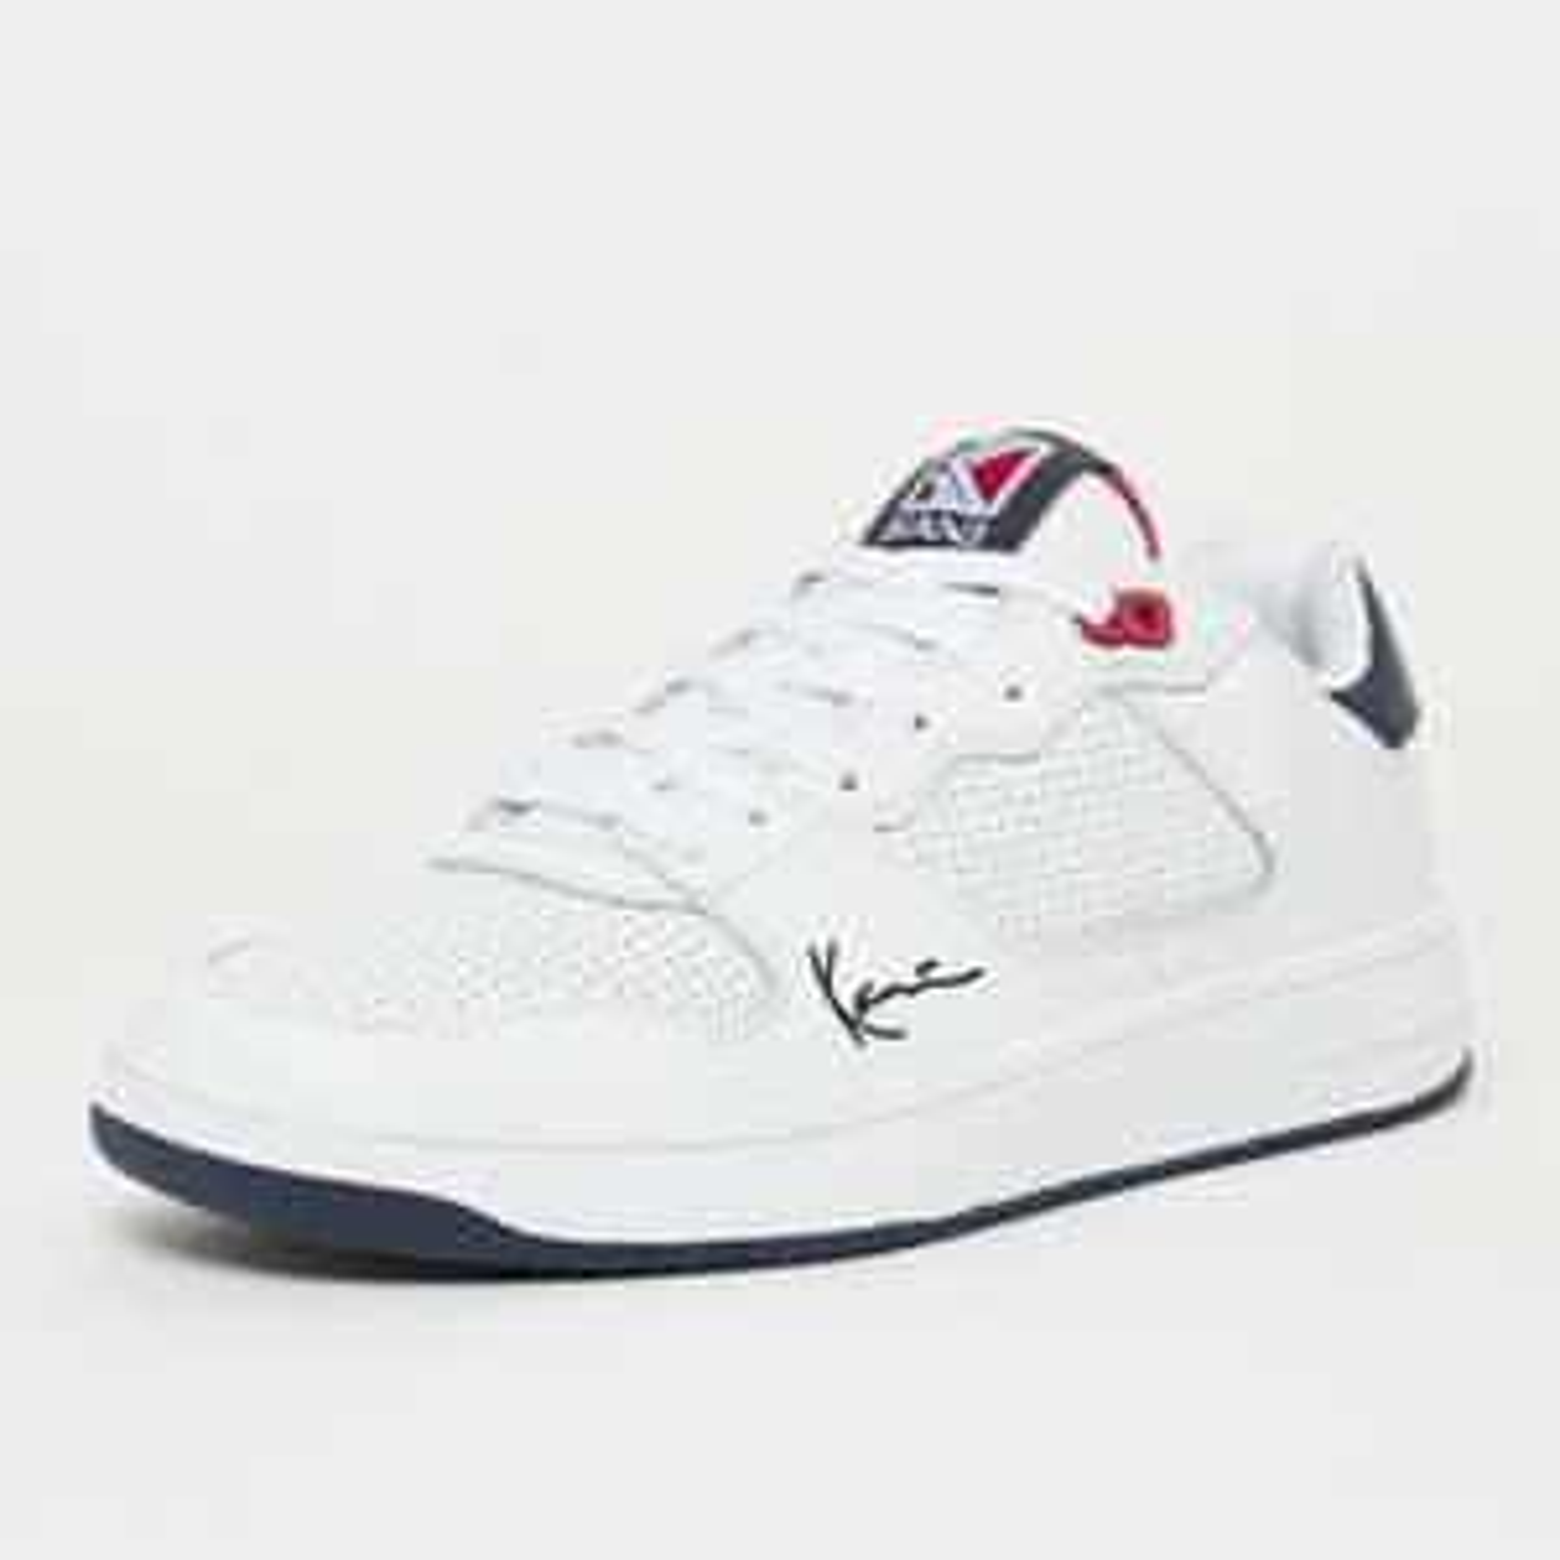 KARL KANI 89 Classic Sneaker für 45,99€ (statt 85€)